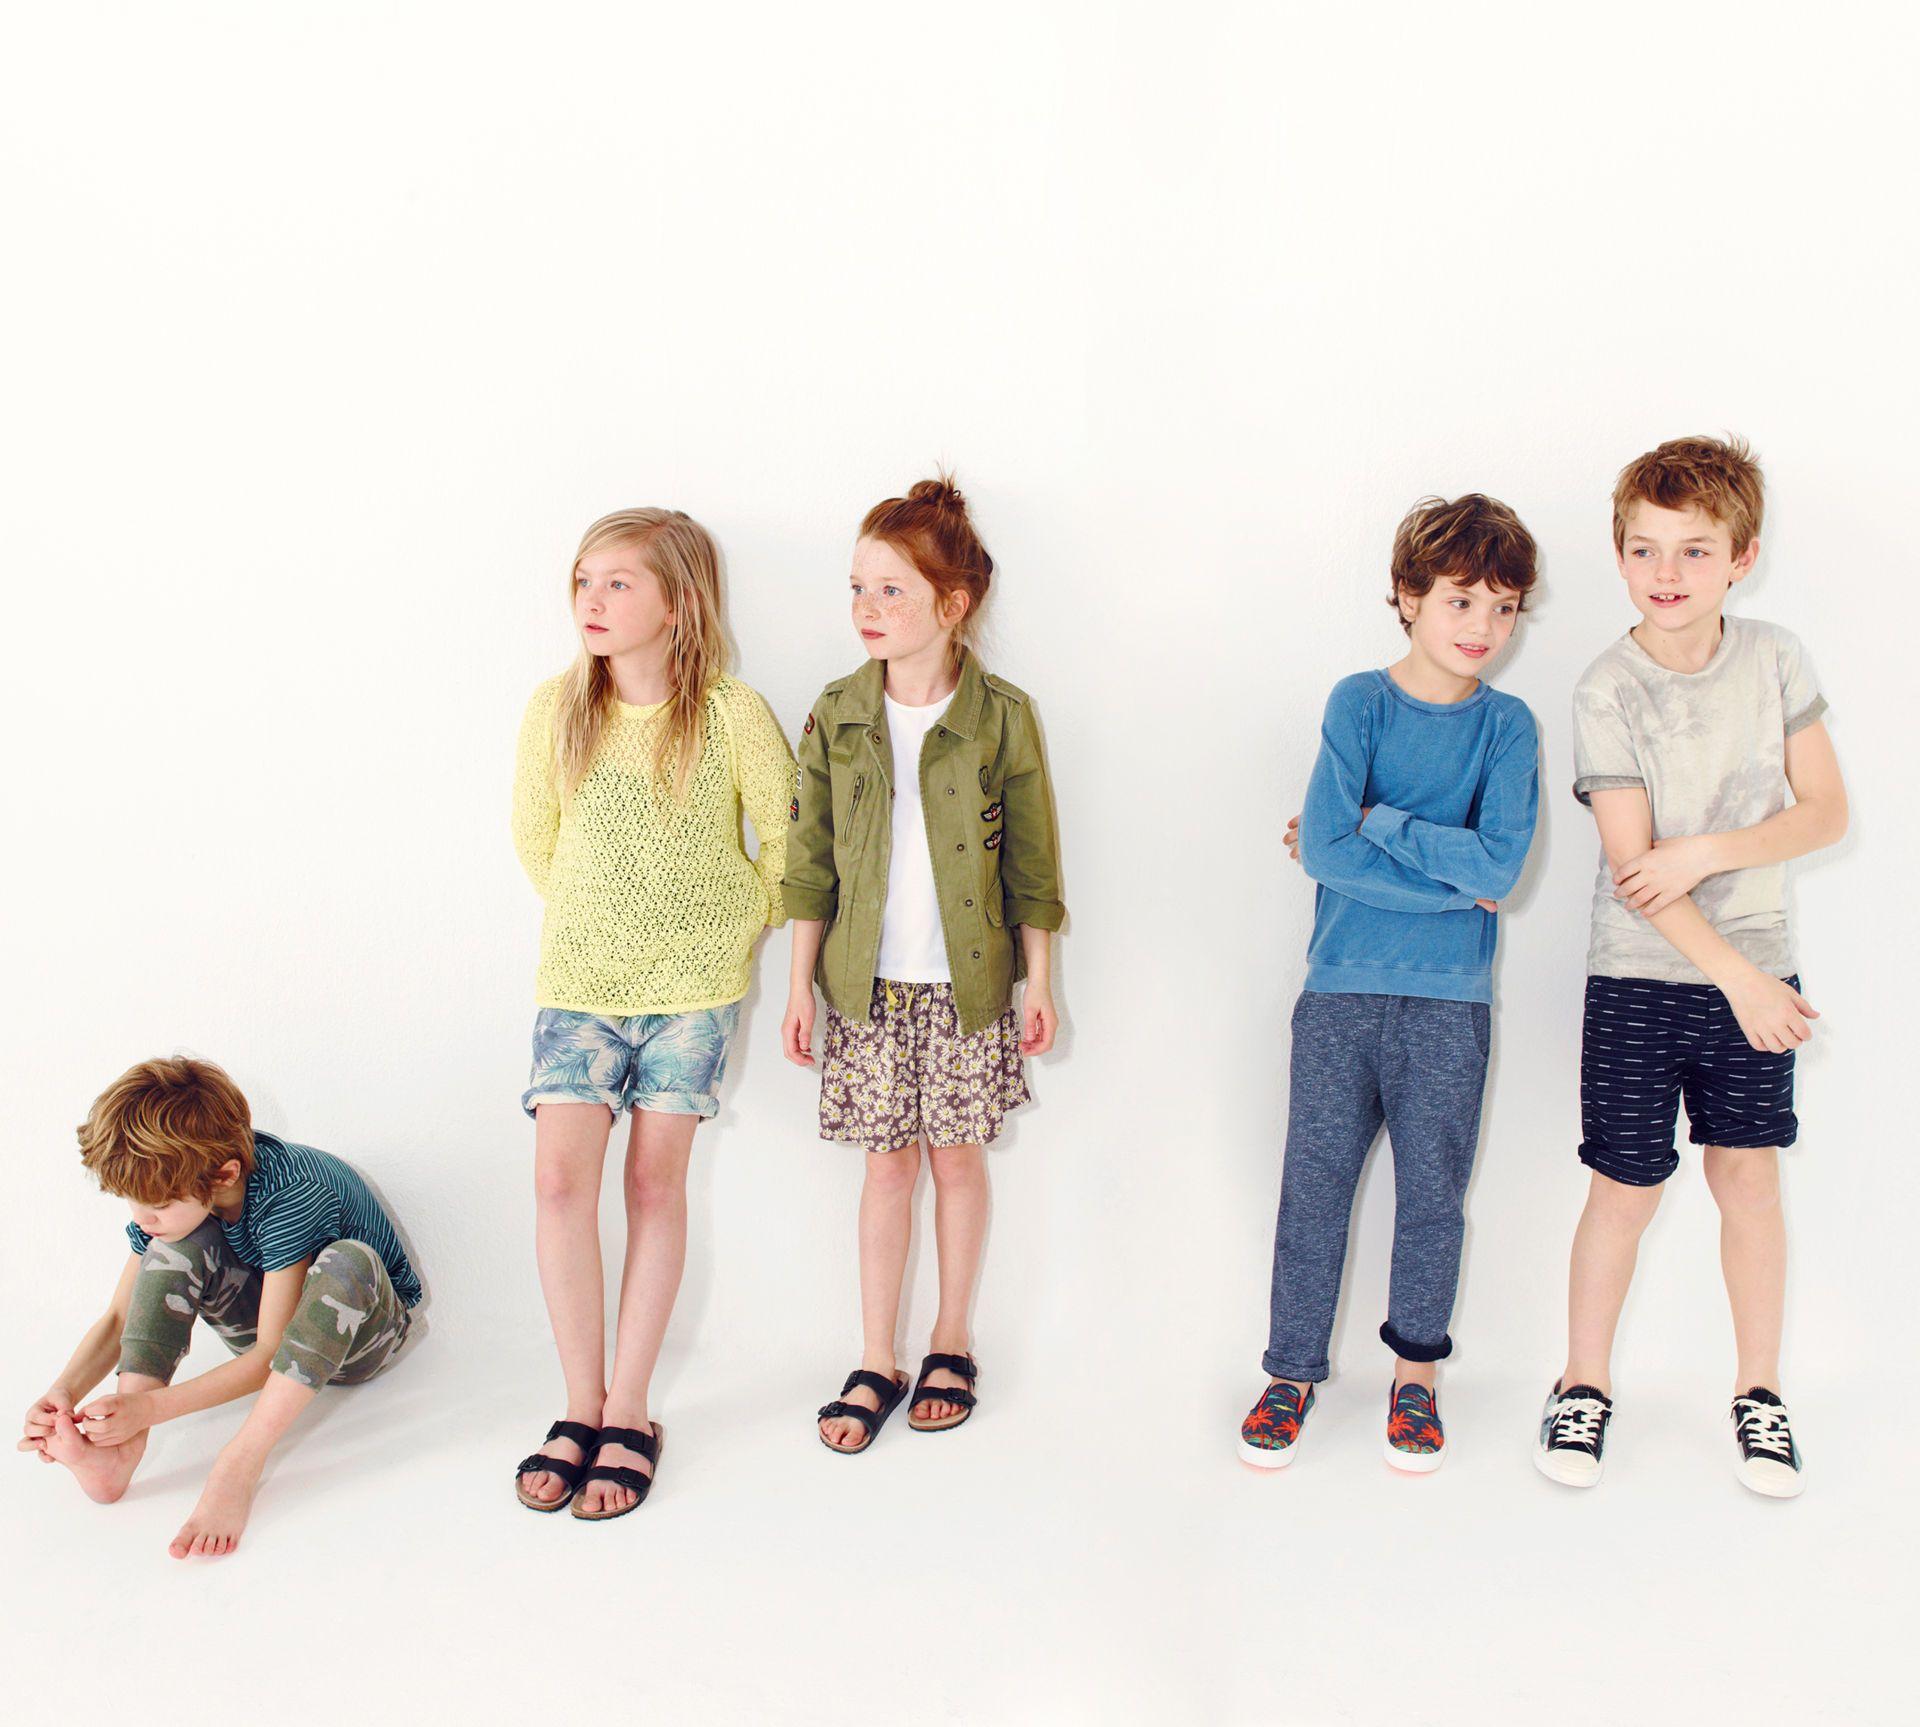 Zara kids february ropa ni a pinterest zara kids - Zara kids catalogo ...